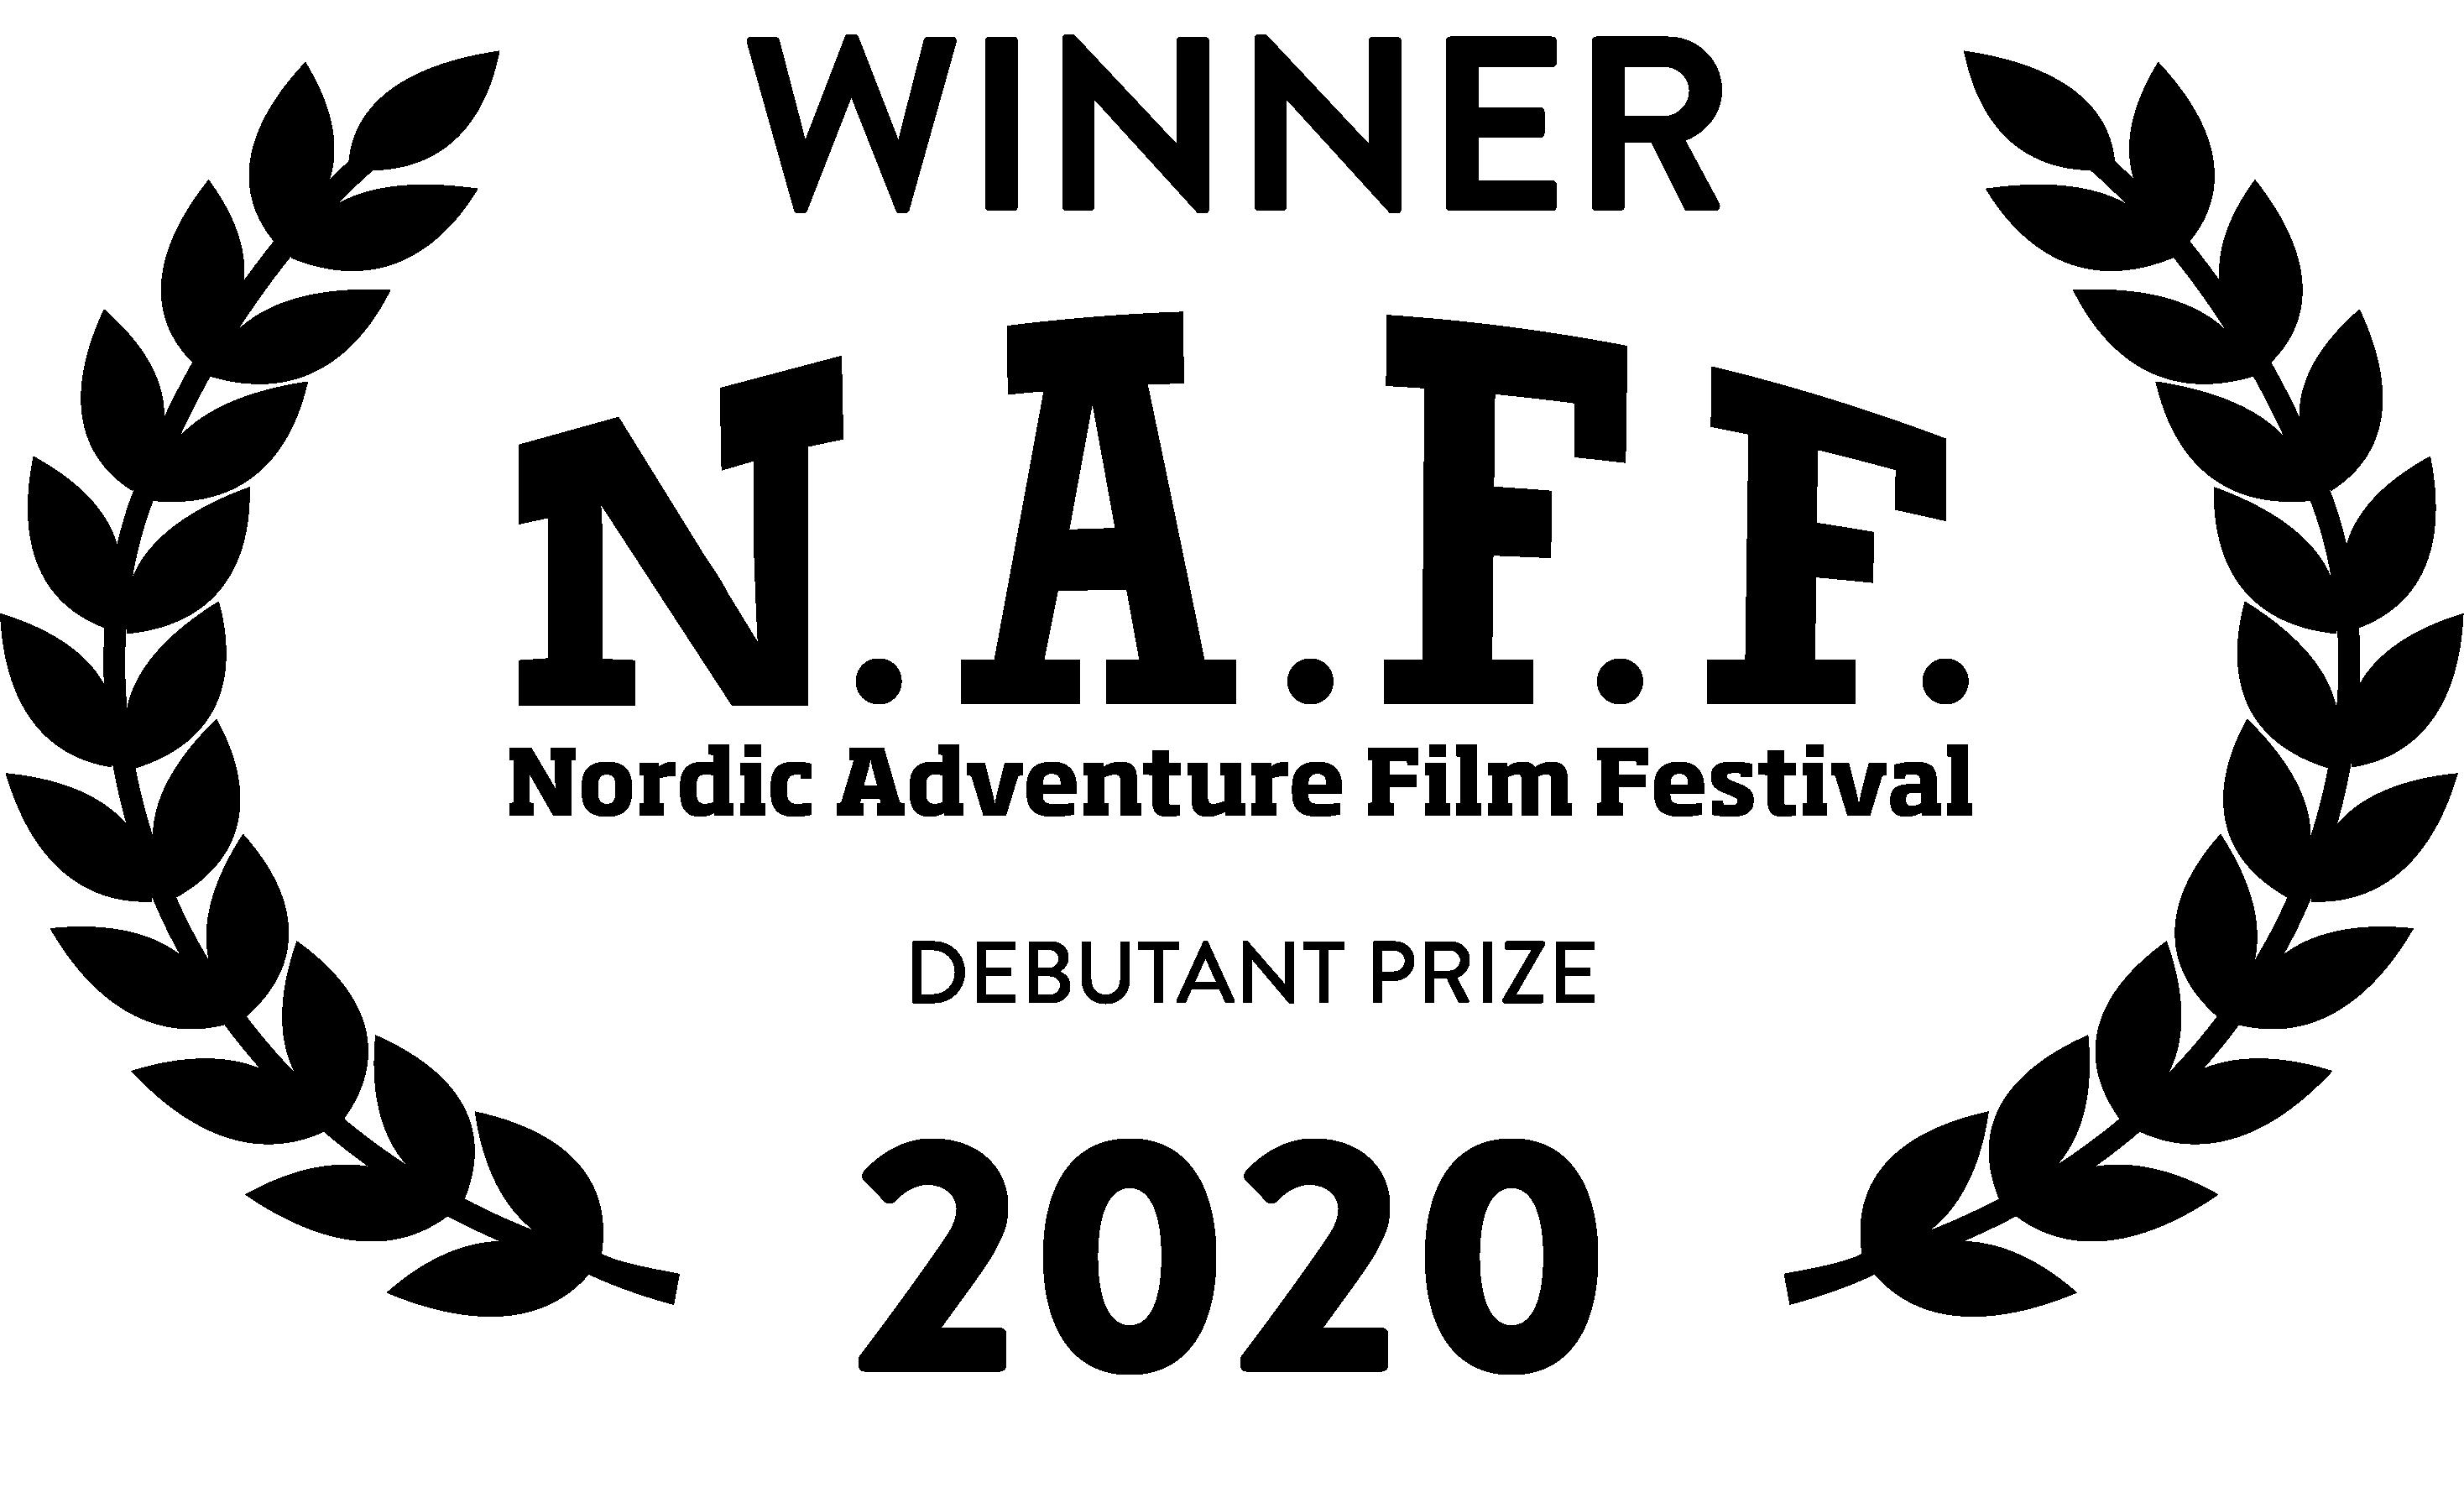 NAFF-2020-WINNER-DEBUTANT-PRIZE-BLACK